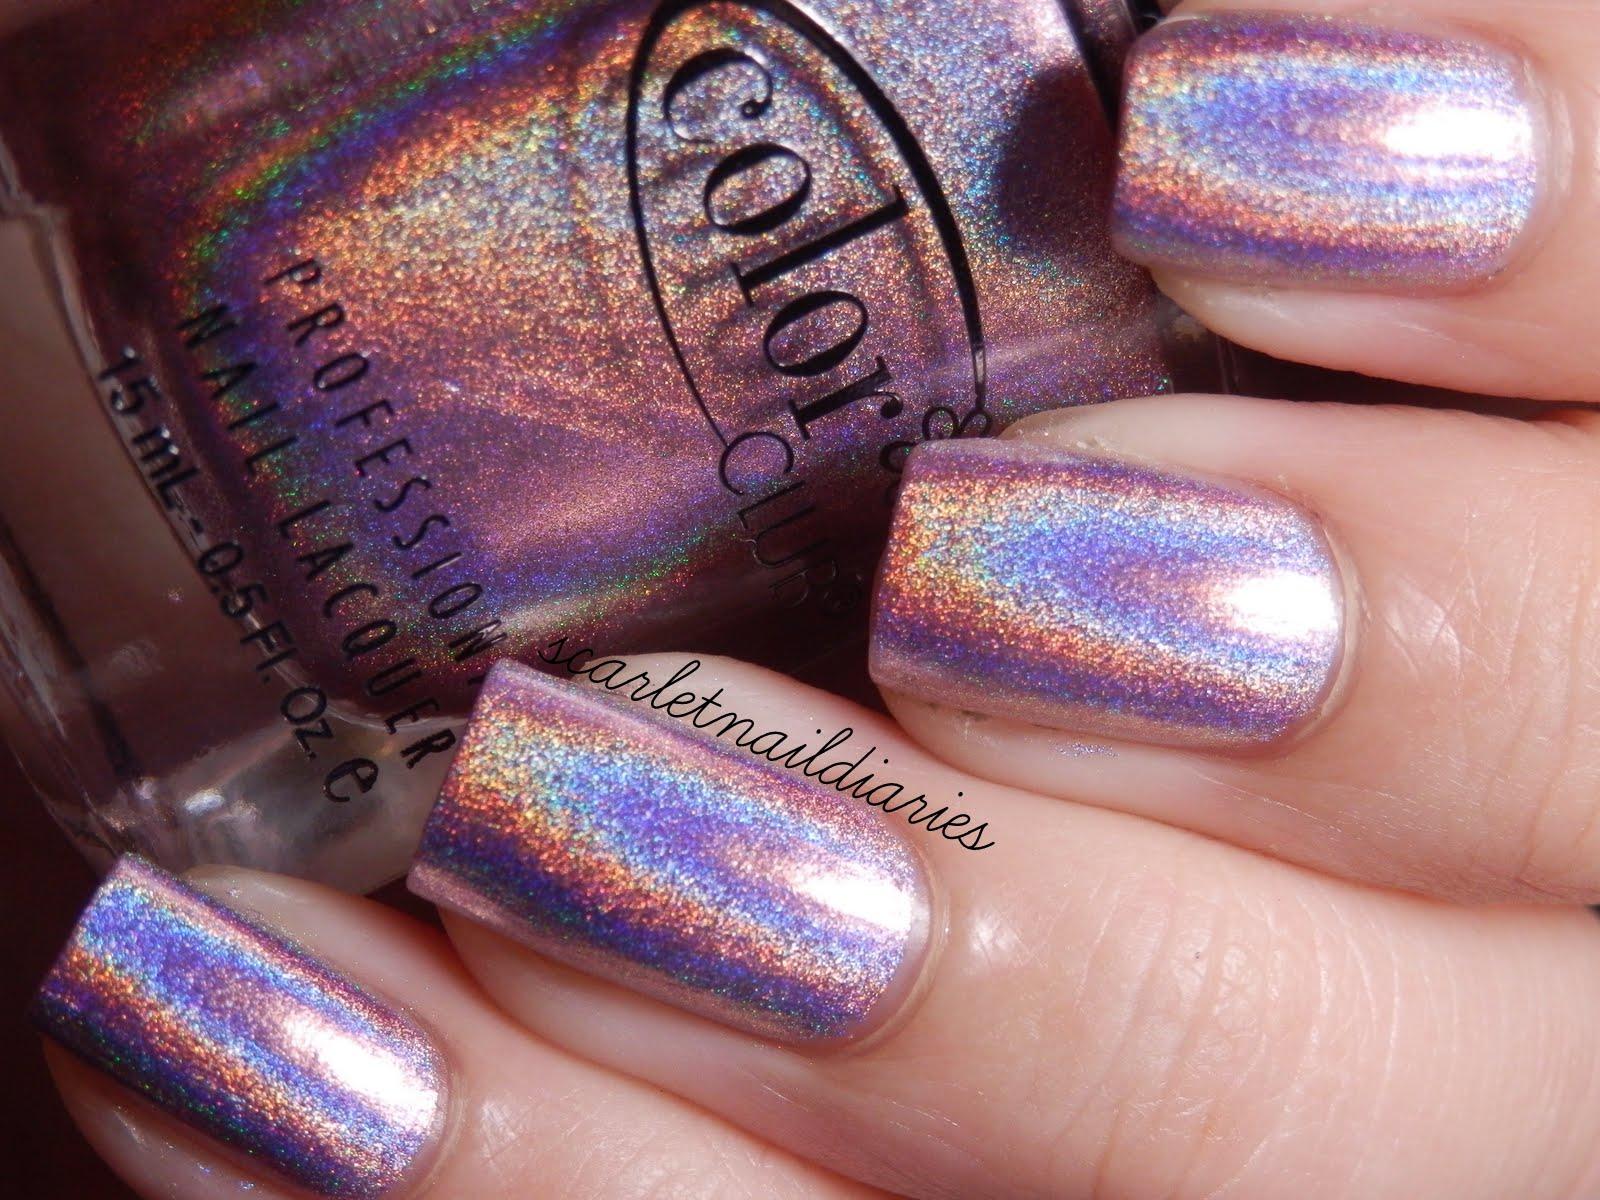 Color Club Cloud Nine Halo Hues Light Pink Holographic Holo Nail Polish 977 On The Hunt